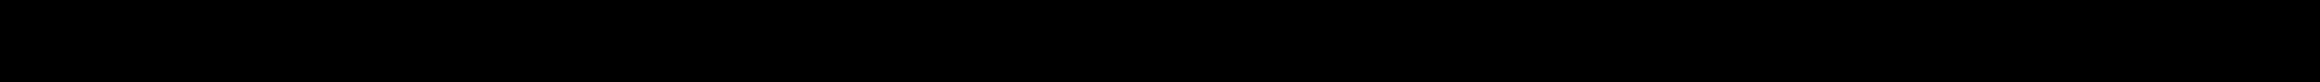 BLIC 7701477832 Stoßstange